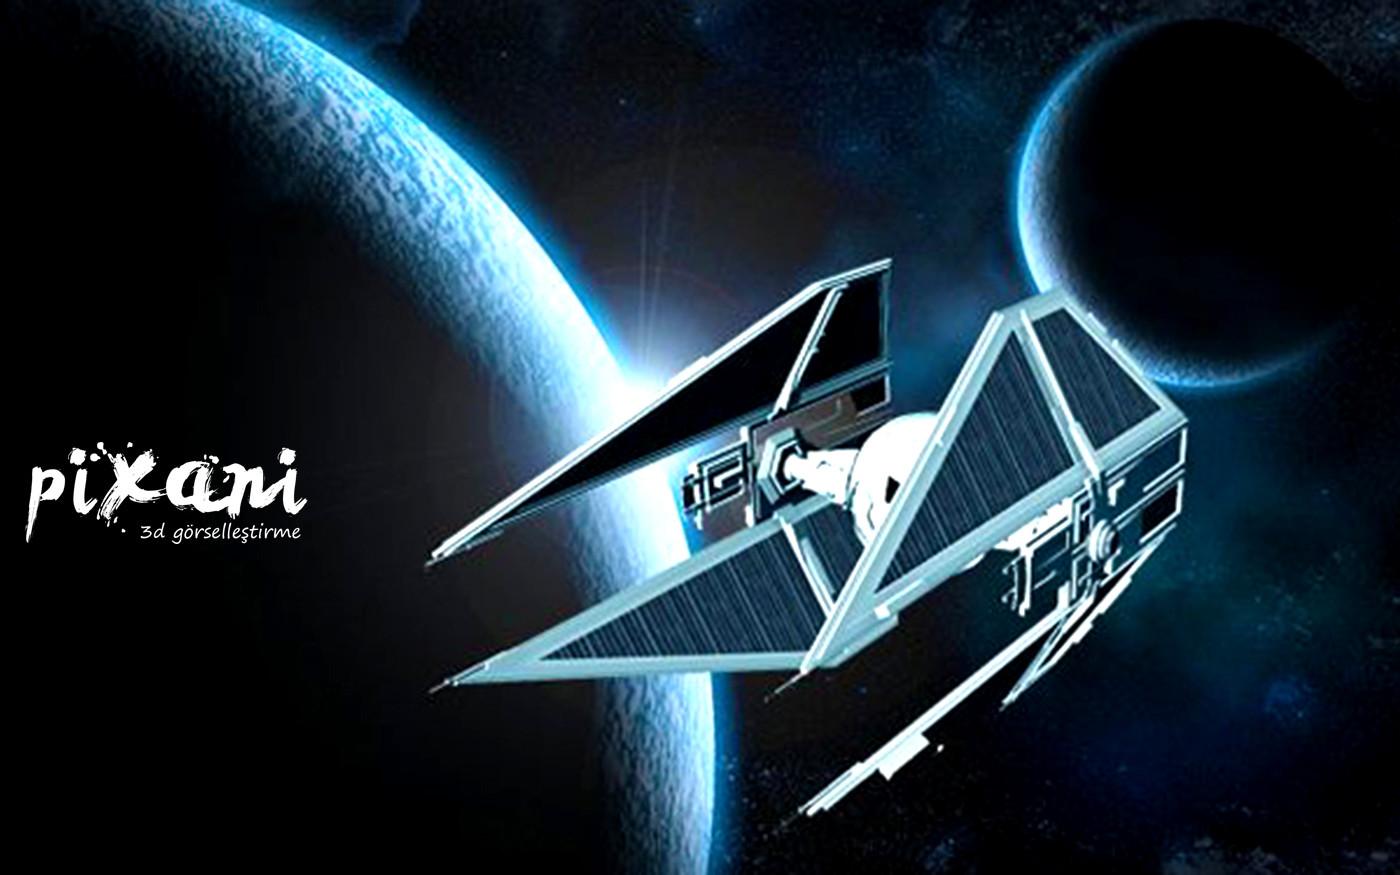 A spacecraft design by Pixani Studios 4 spacecraft wings with solar panels 1 spaceship platform and engine platform